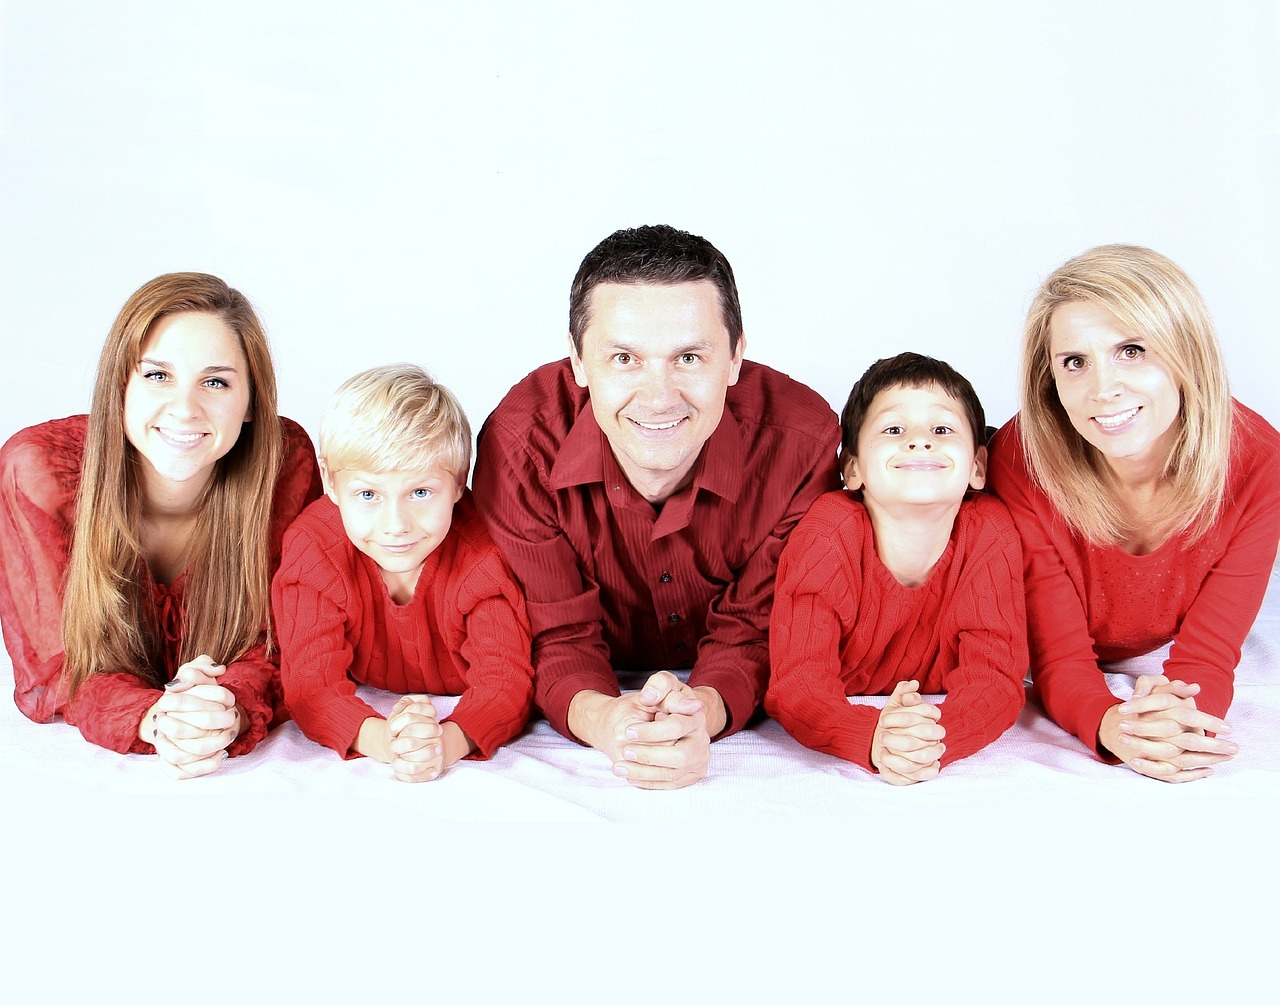 3 Razoes Seguro de Vida e Indispensavel